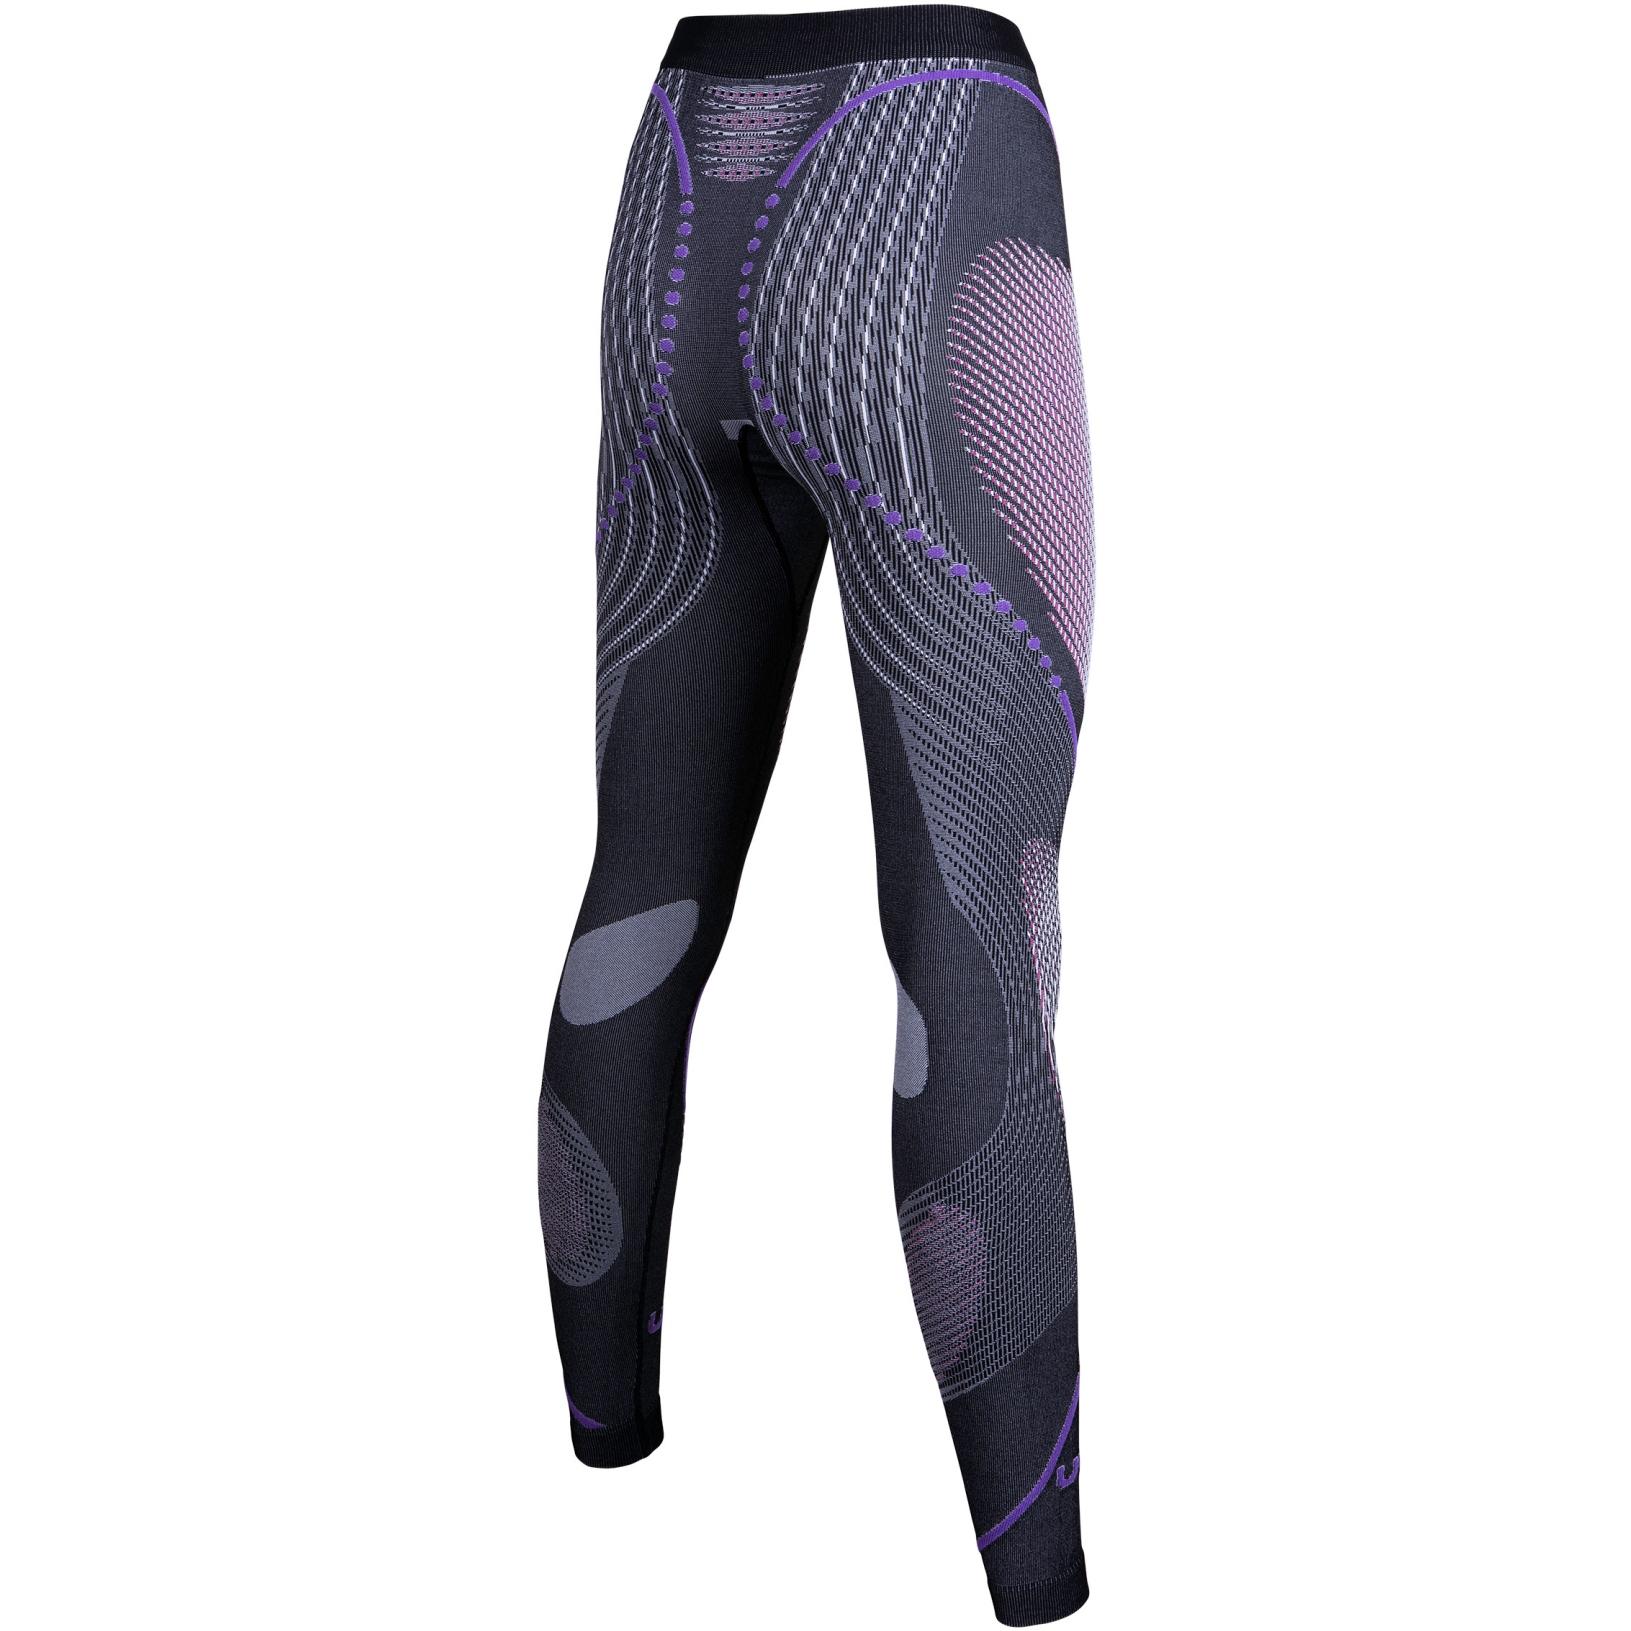 Image of UYN Evolutyon Melange Underwear Pants Long Women - Anthracite Melange/Raspberry/Purple